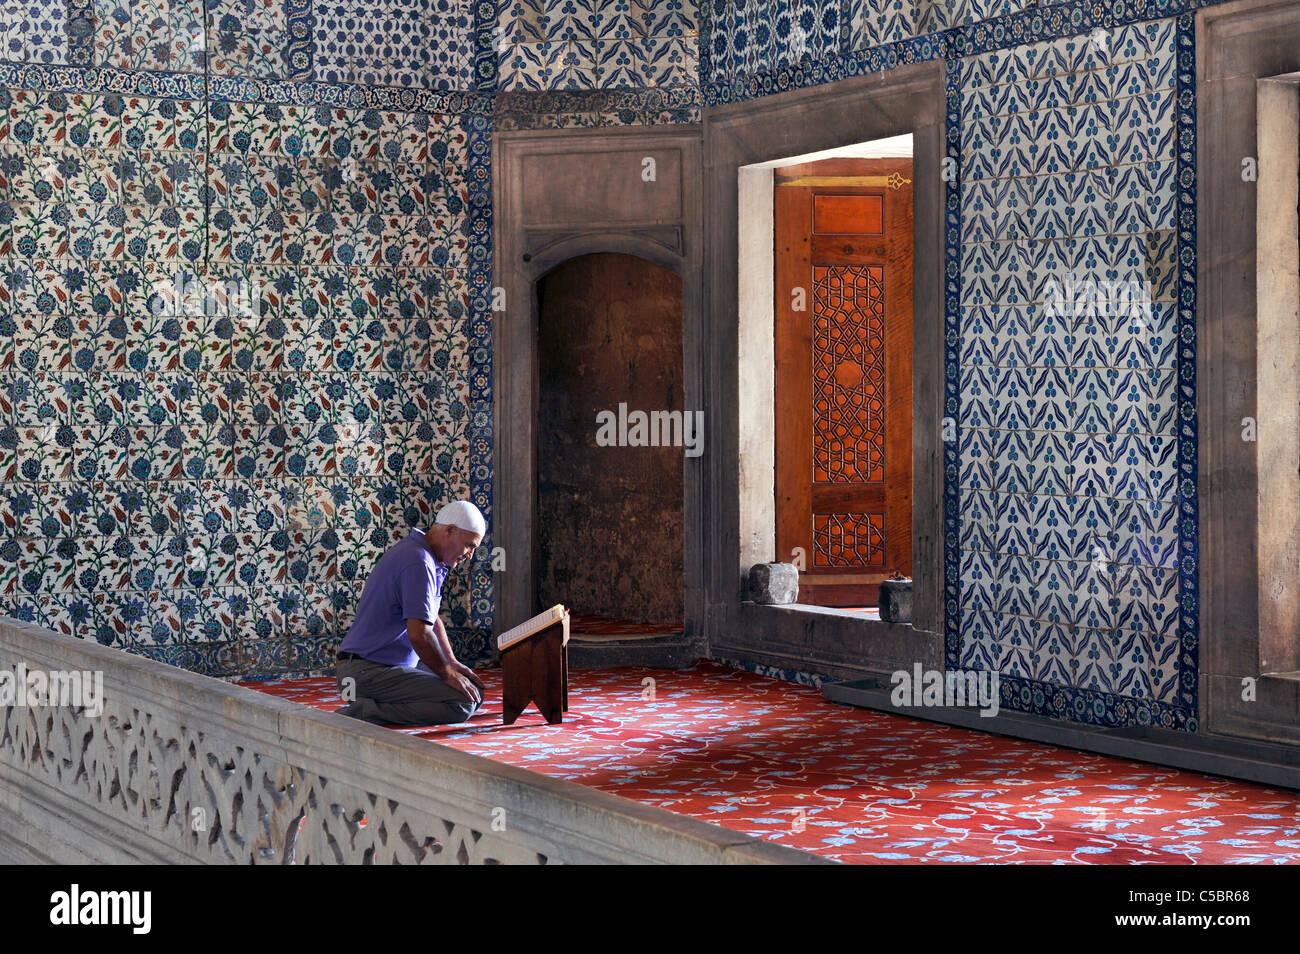 Muslim man reading Koran in Blue Mosque Istanbul Turkey - Stock Image